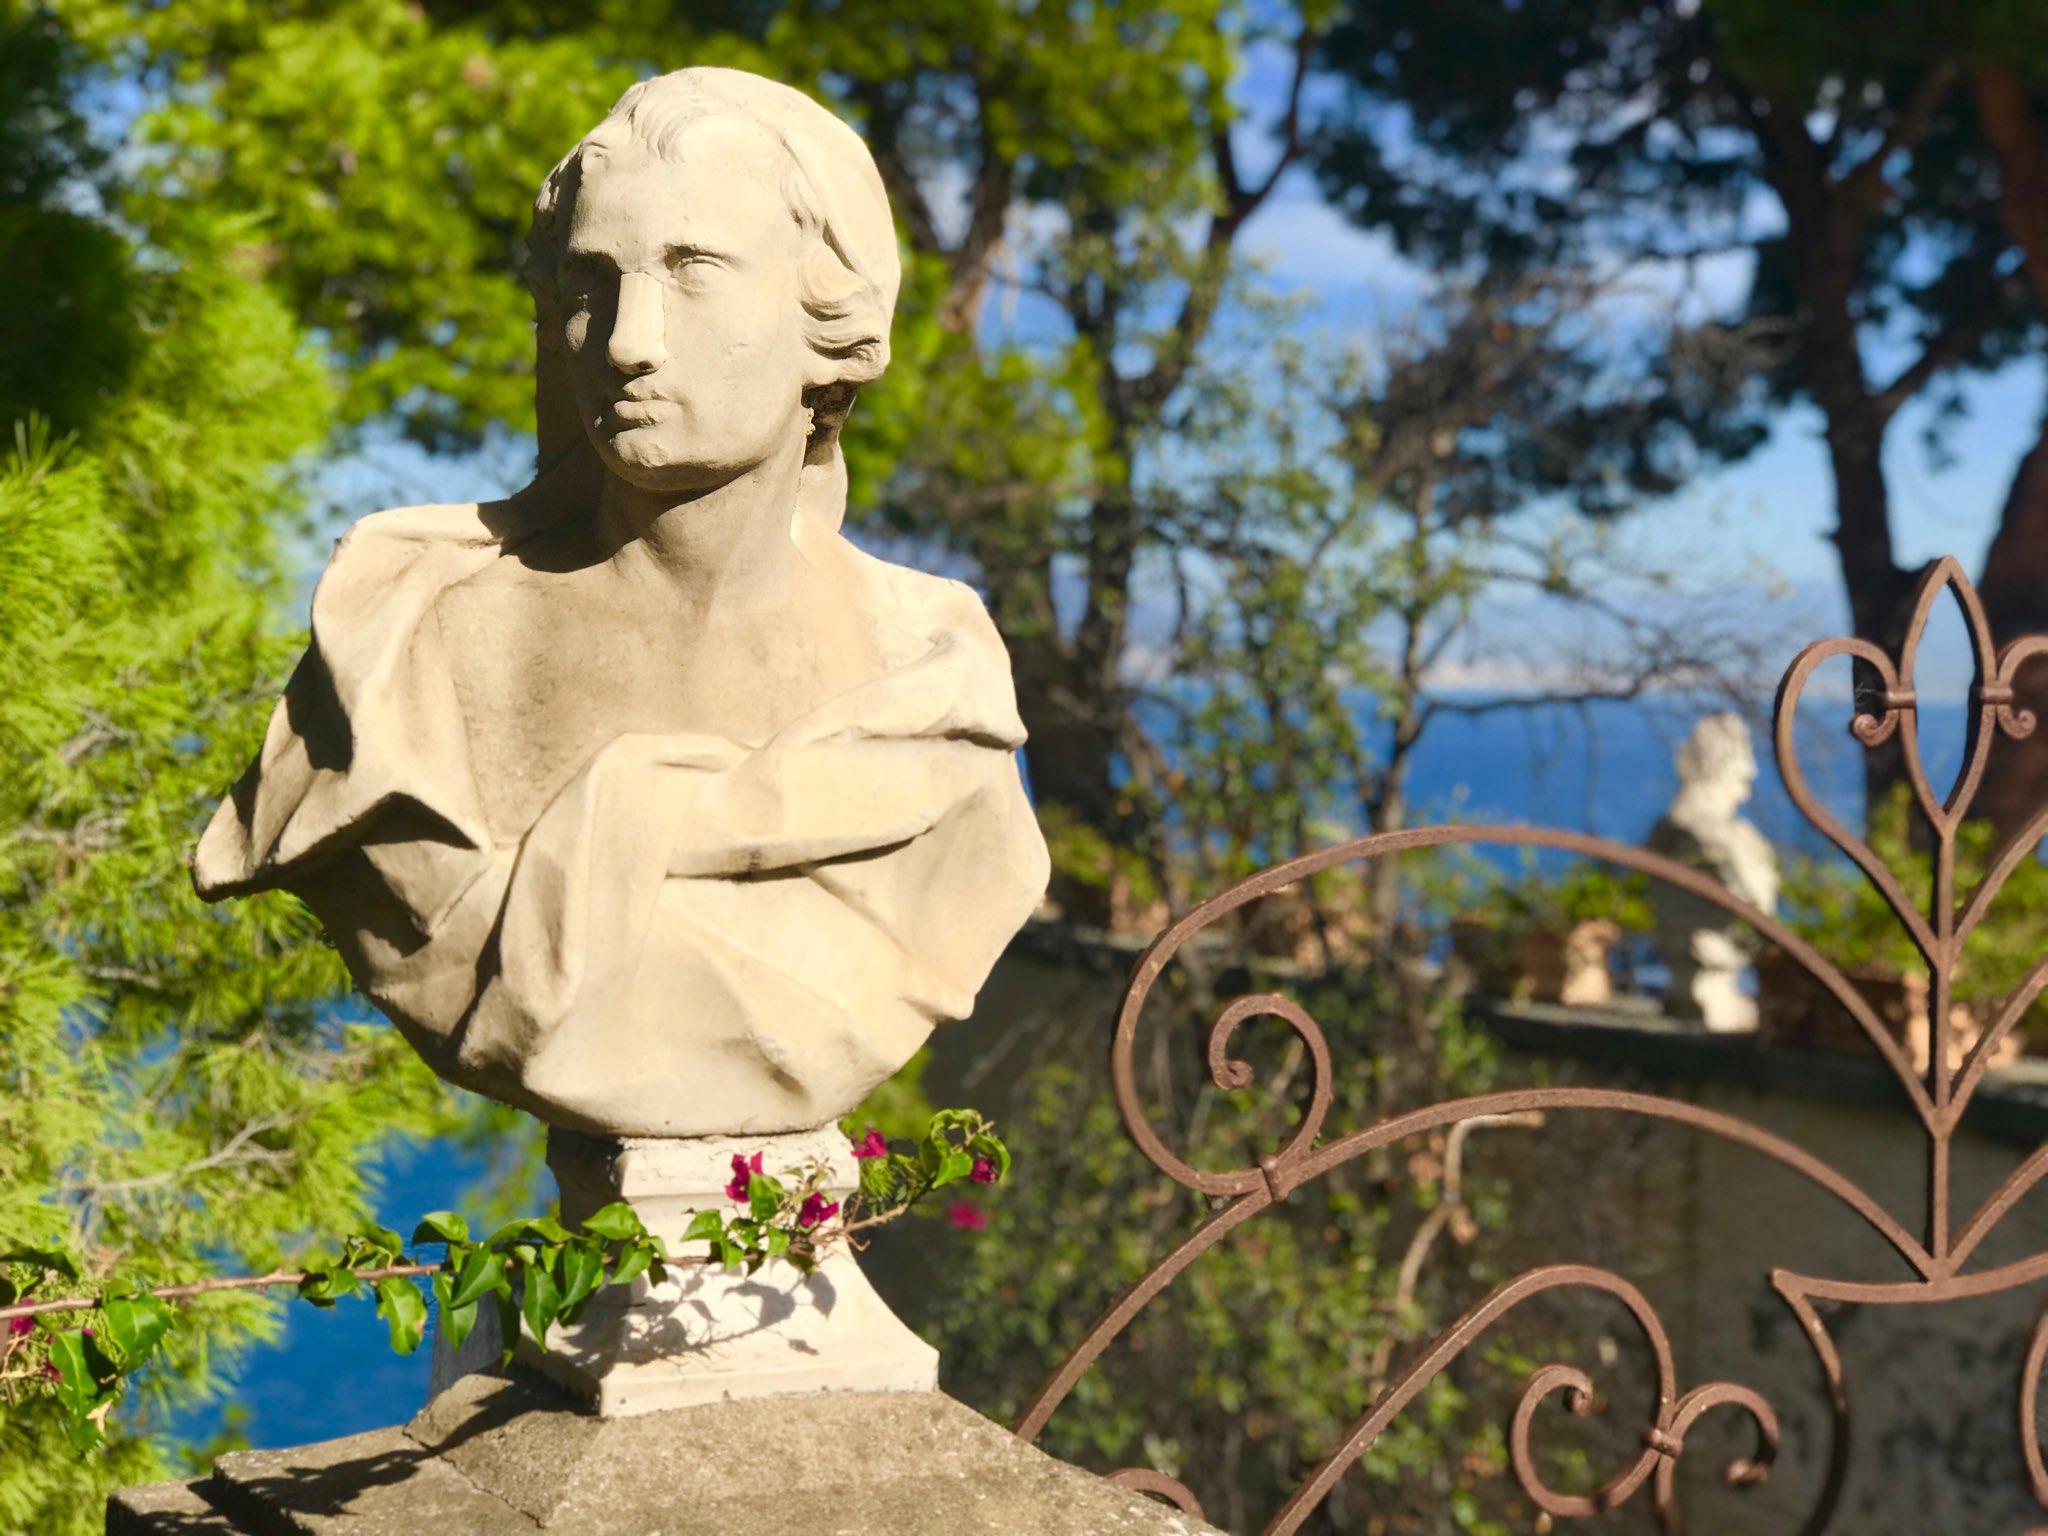 Love the Old World charm, in Sorrento 🍋 #Italy #Travel #photography #art #europe #passion #italia #Sorrento #amalficoast #bellaitalia #ILoveItaly https://t.co/86afeVXan8